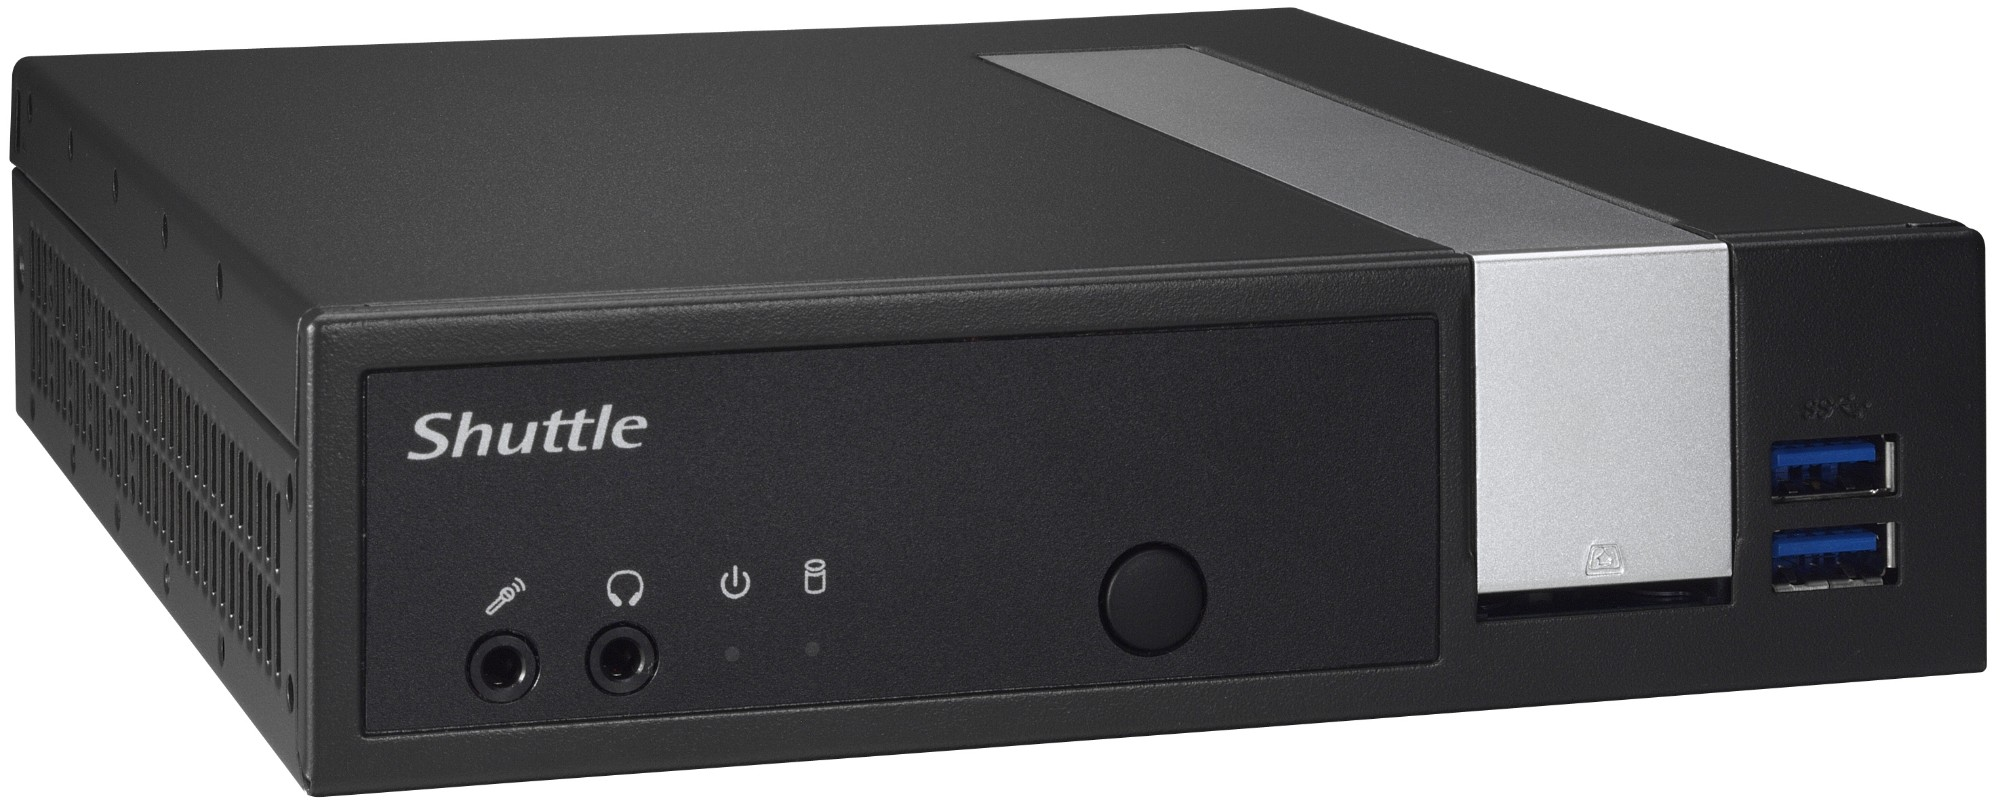 Shuttle XPÐ¡ slim DL10J Intel SoC 2GHz J4005 Black PC/workstation barebone